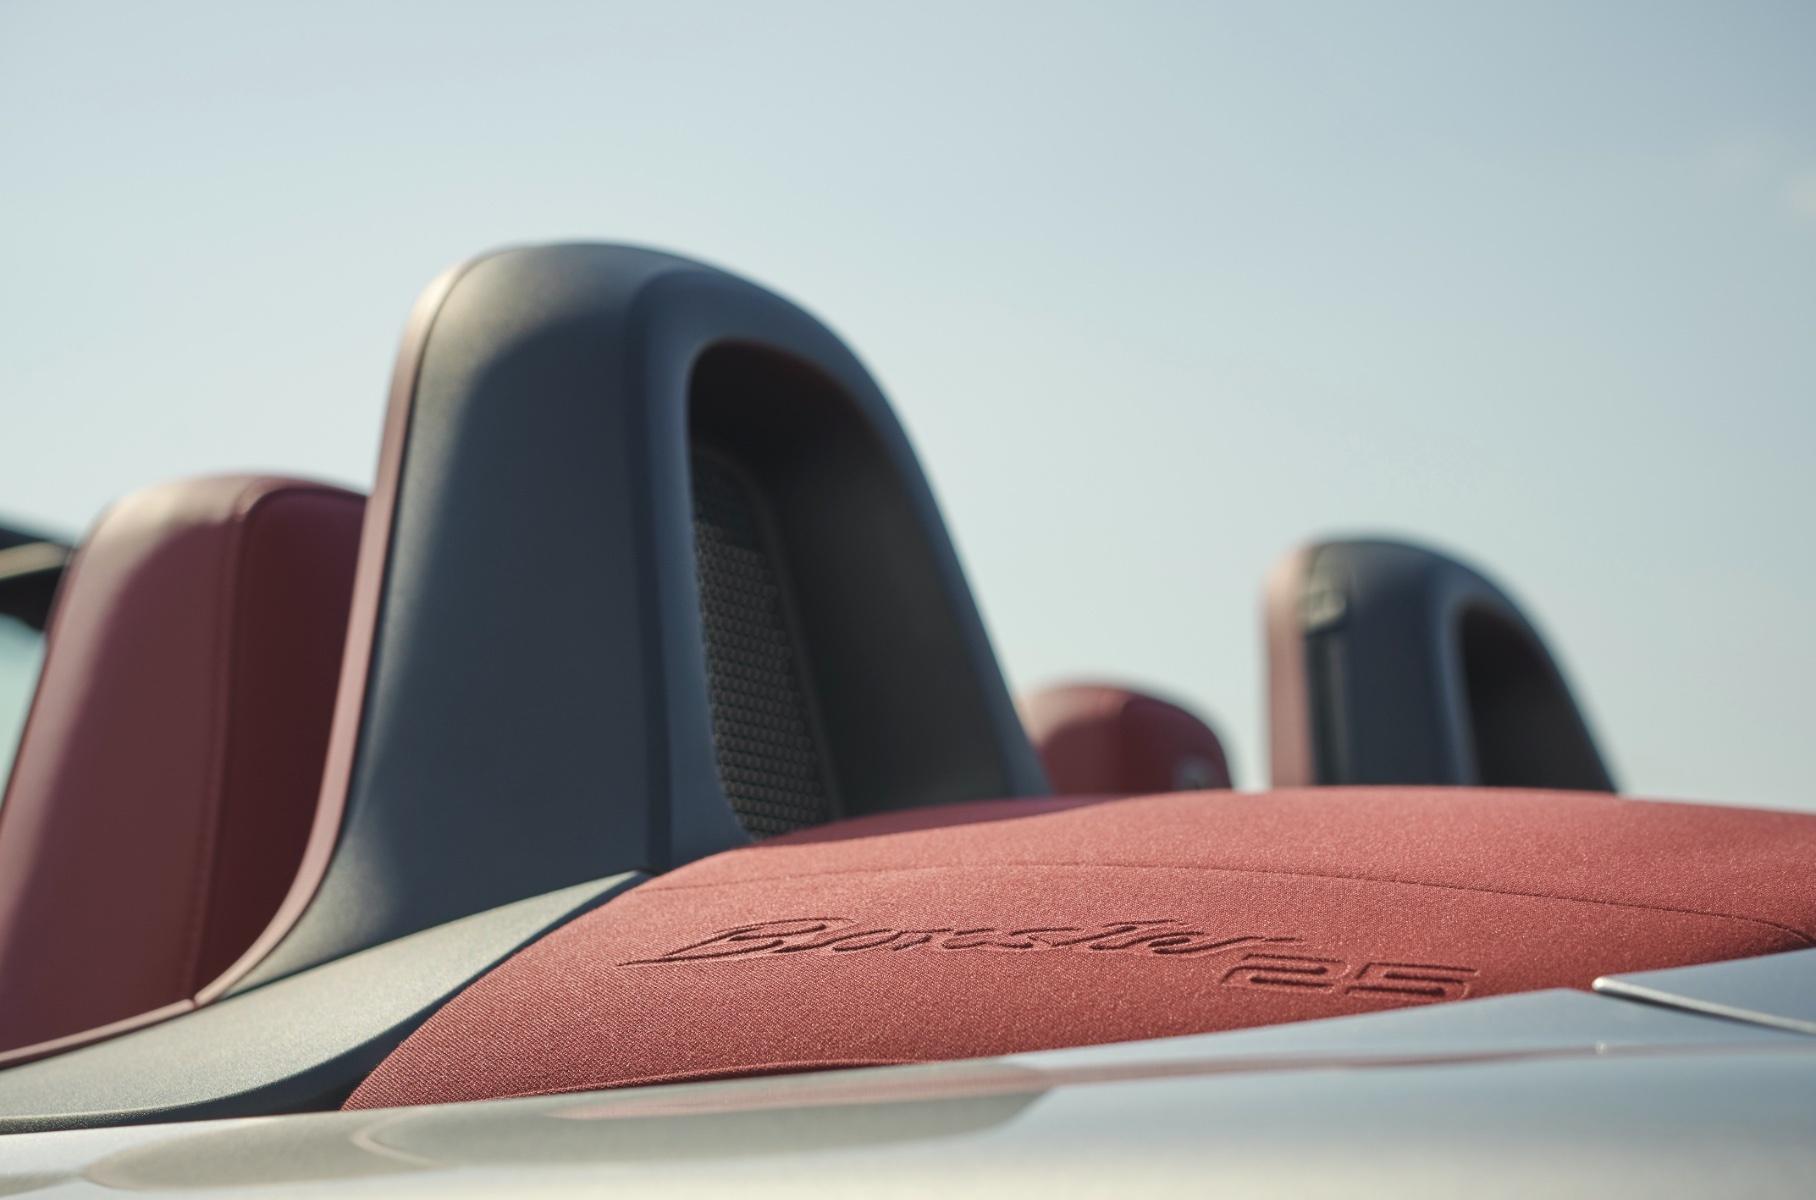 Porsche Boxster 25 Years отпразднует 25-летие модели